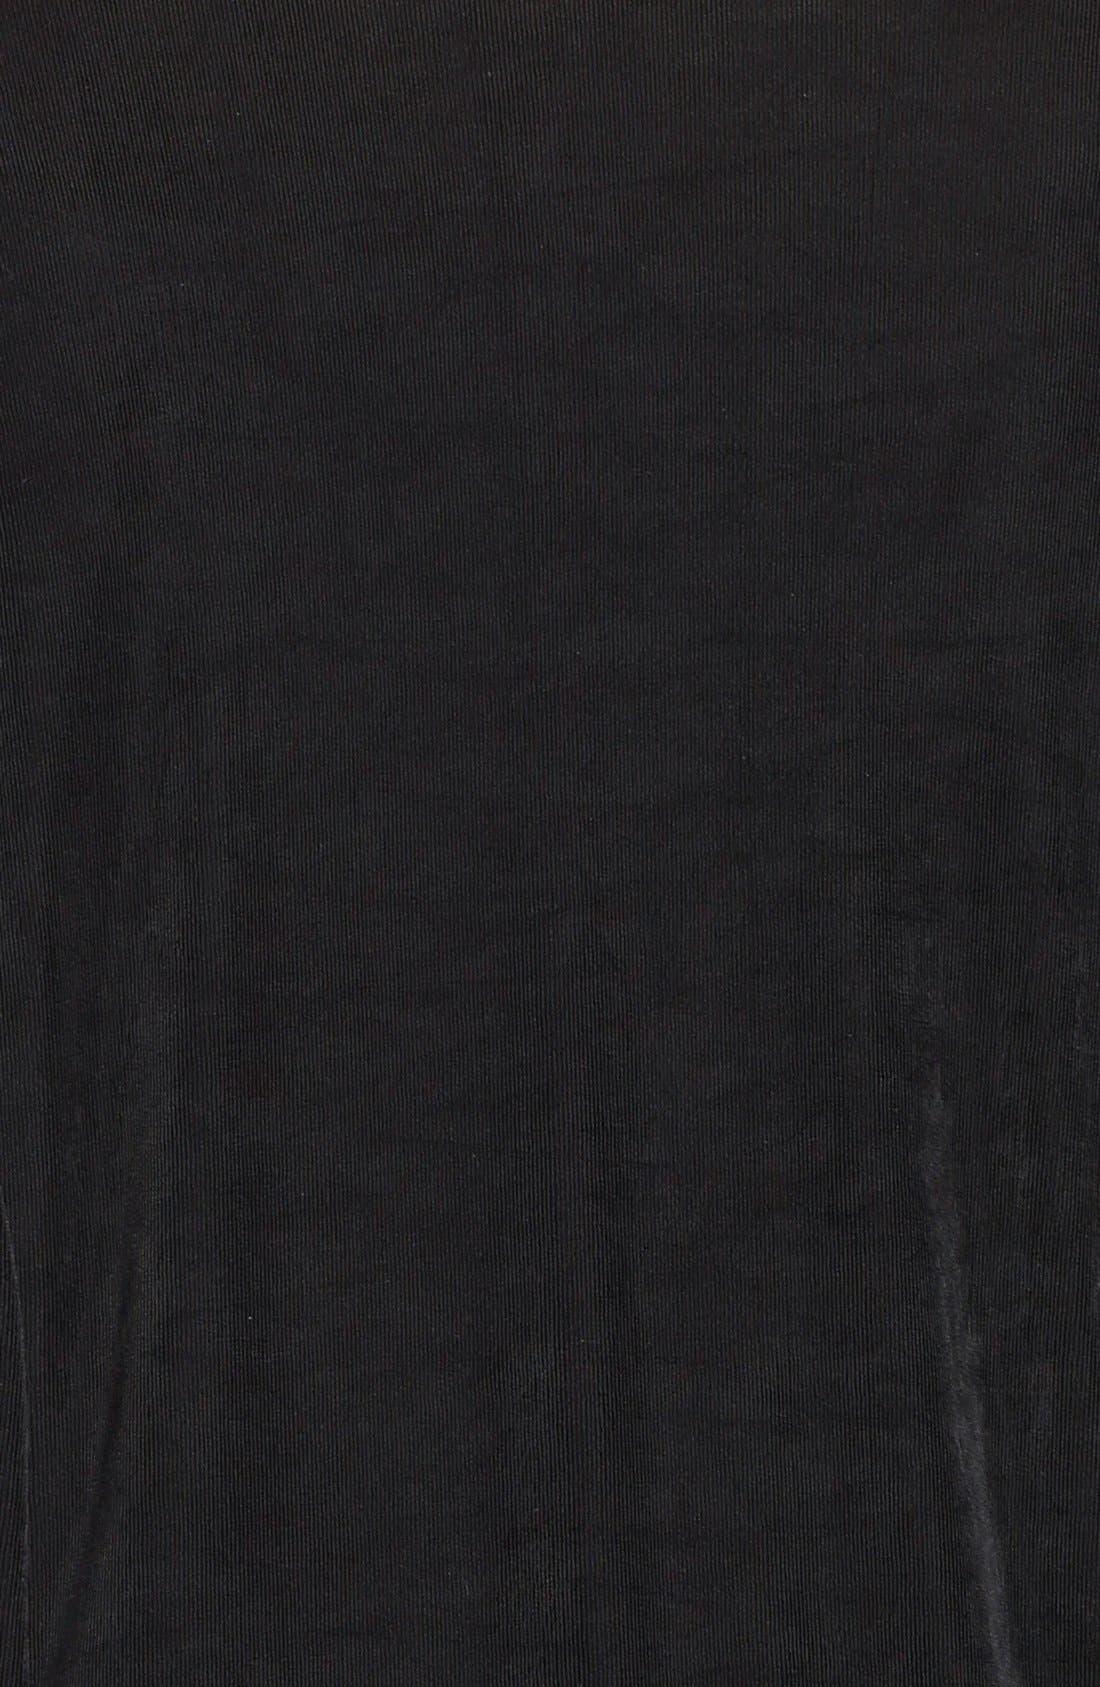 One-Button Stretch Knit Blazer,                             Alternate thumbnail 9, color,                             BLACK